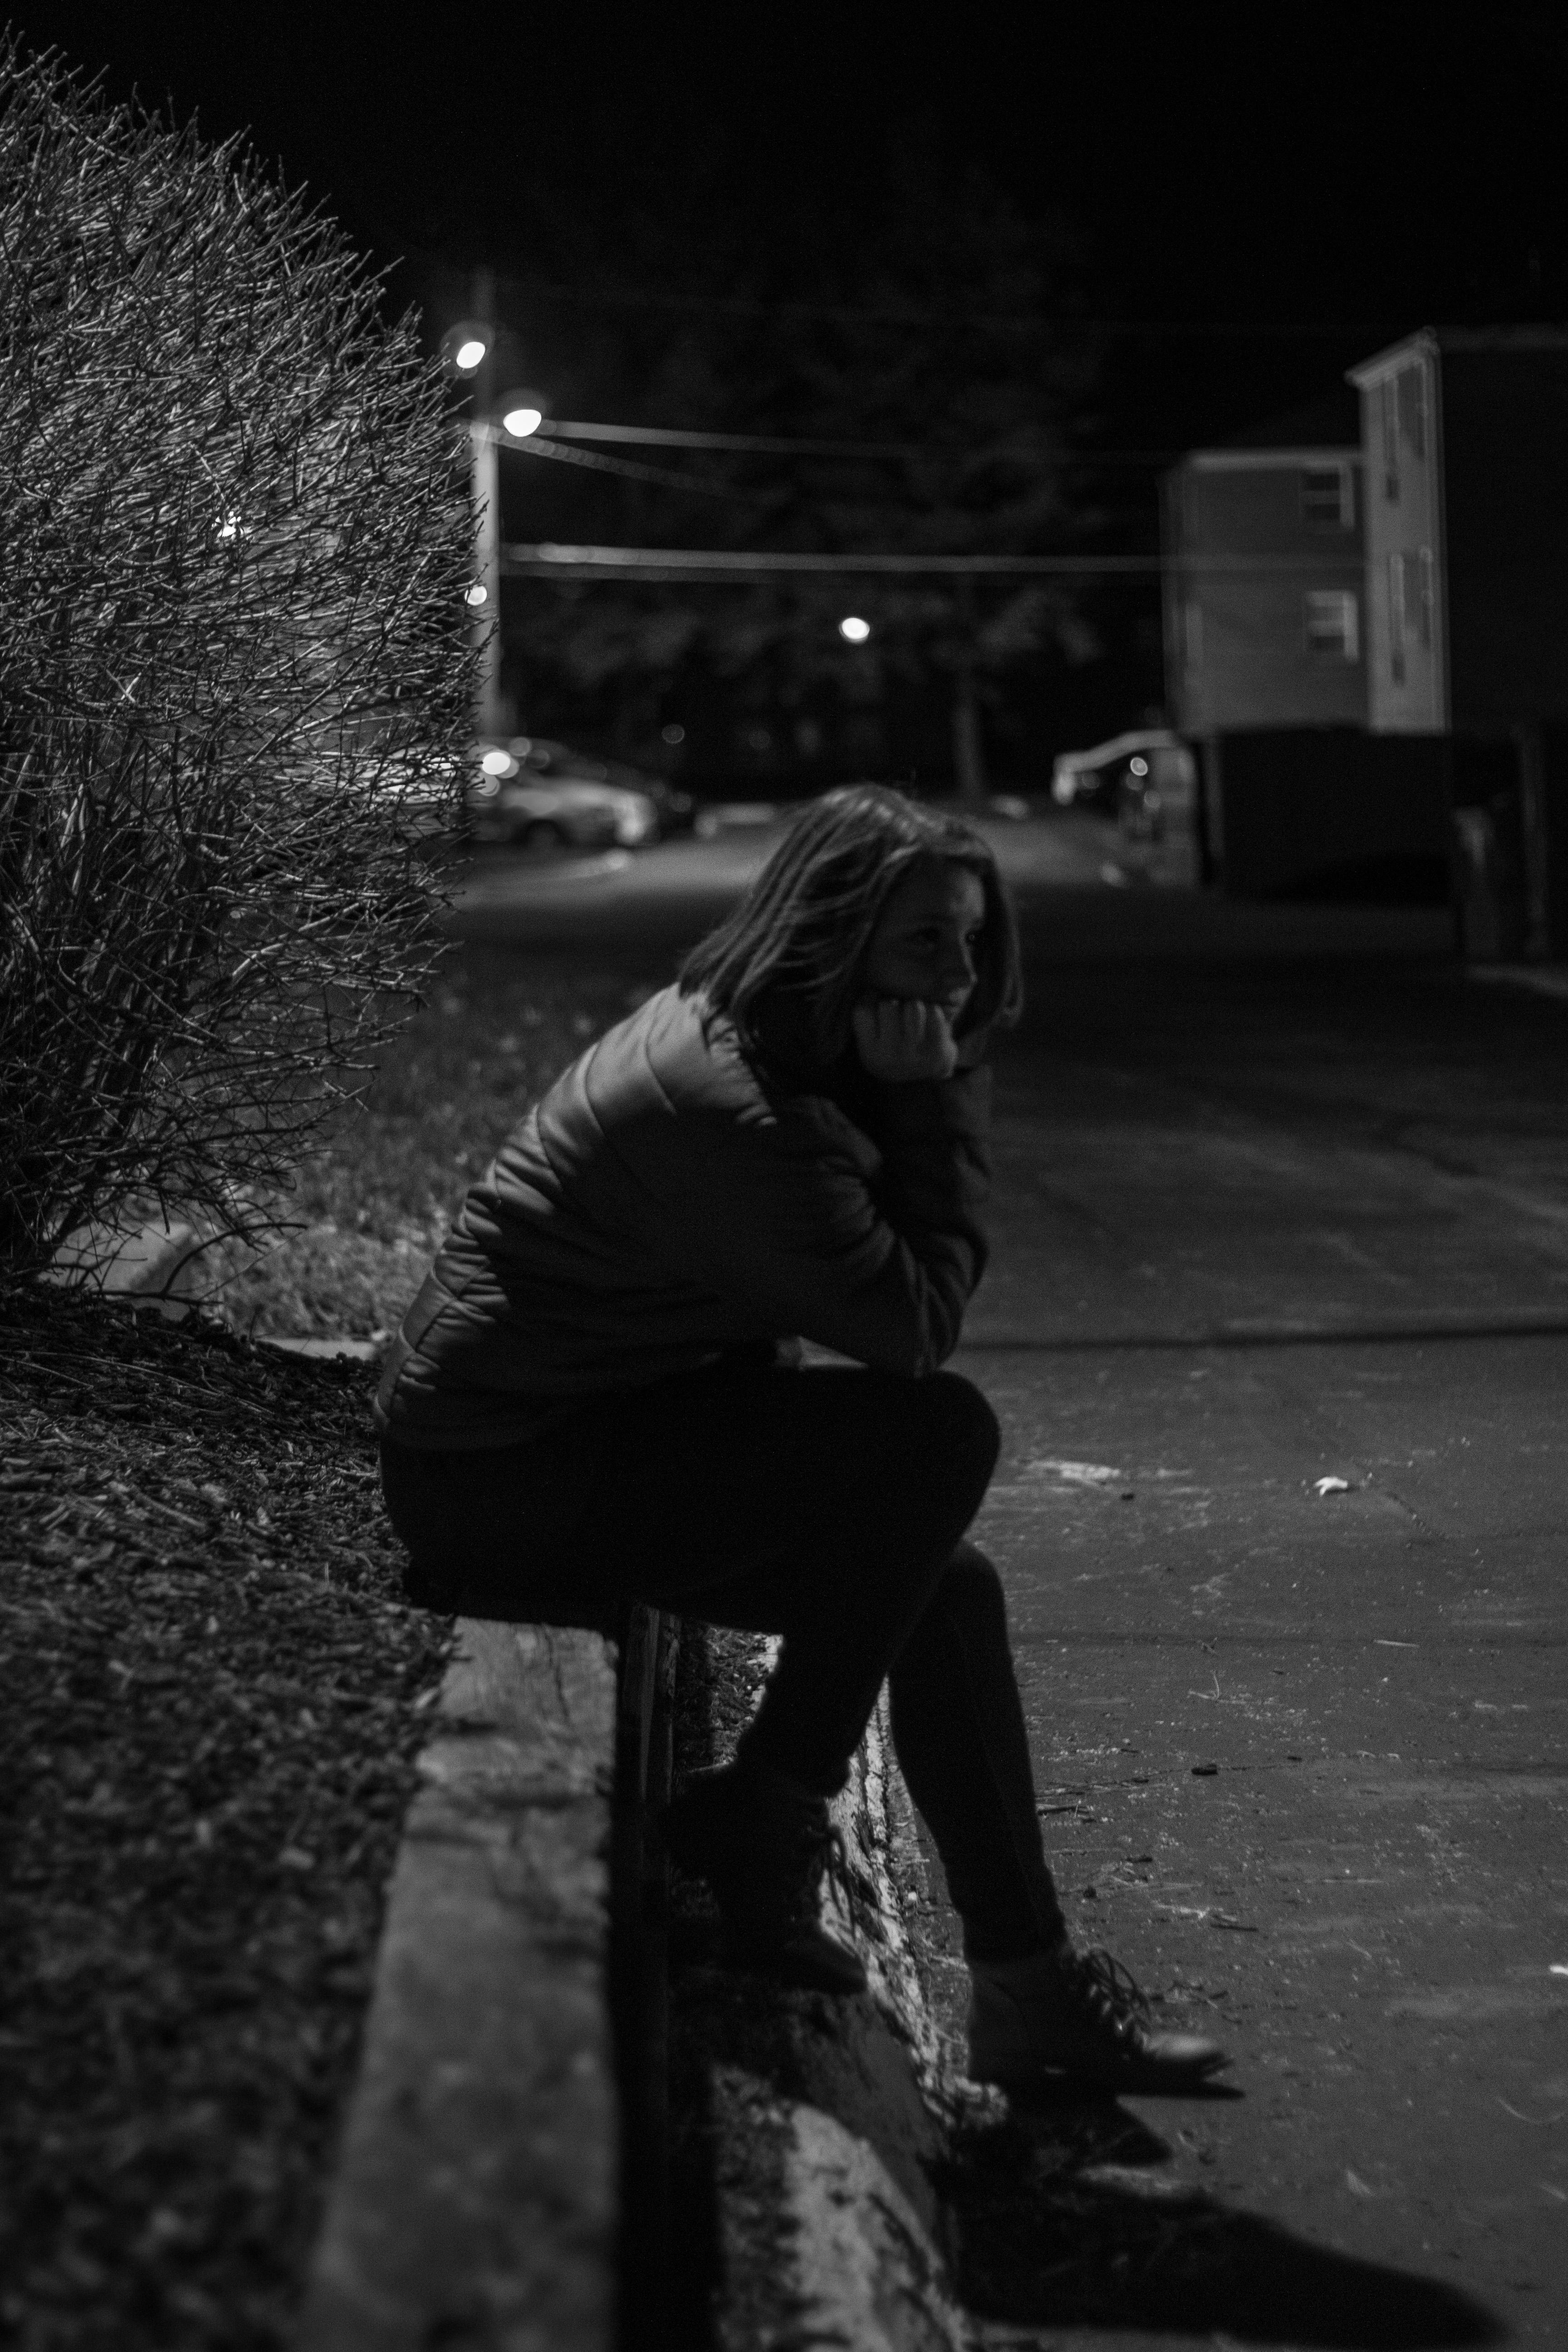 Woman Wearing Jacket Sitting On Concrete During Night Time